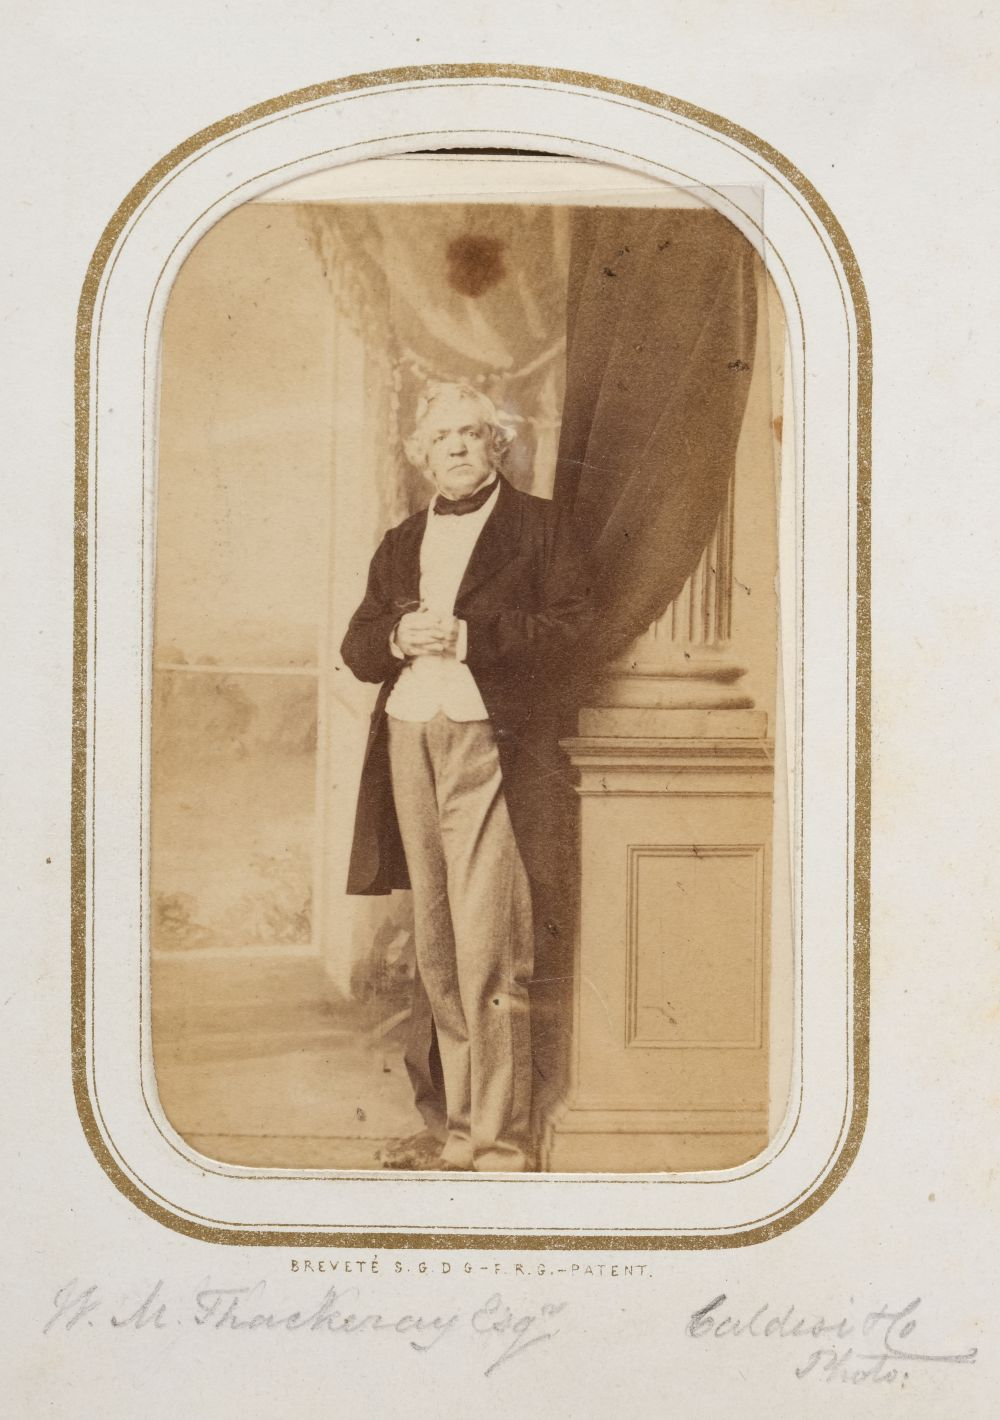 * Cartes de visite. A cartes-de-visite album, c. 1860s/1880s - Image 7 of 18